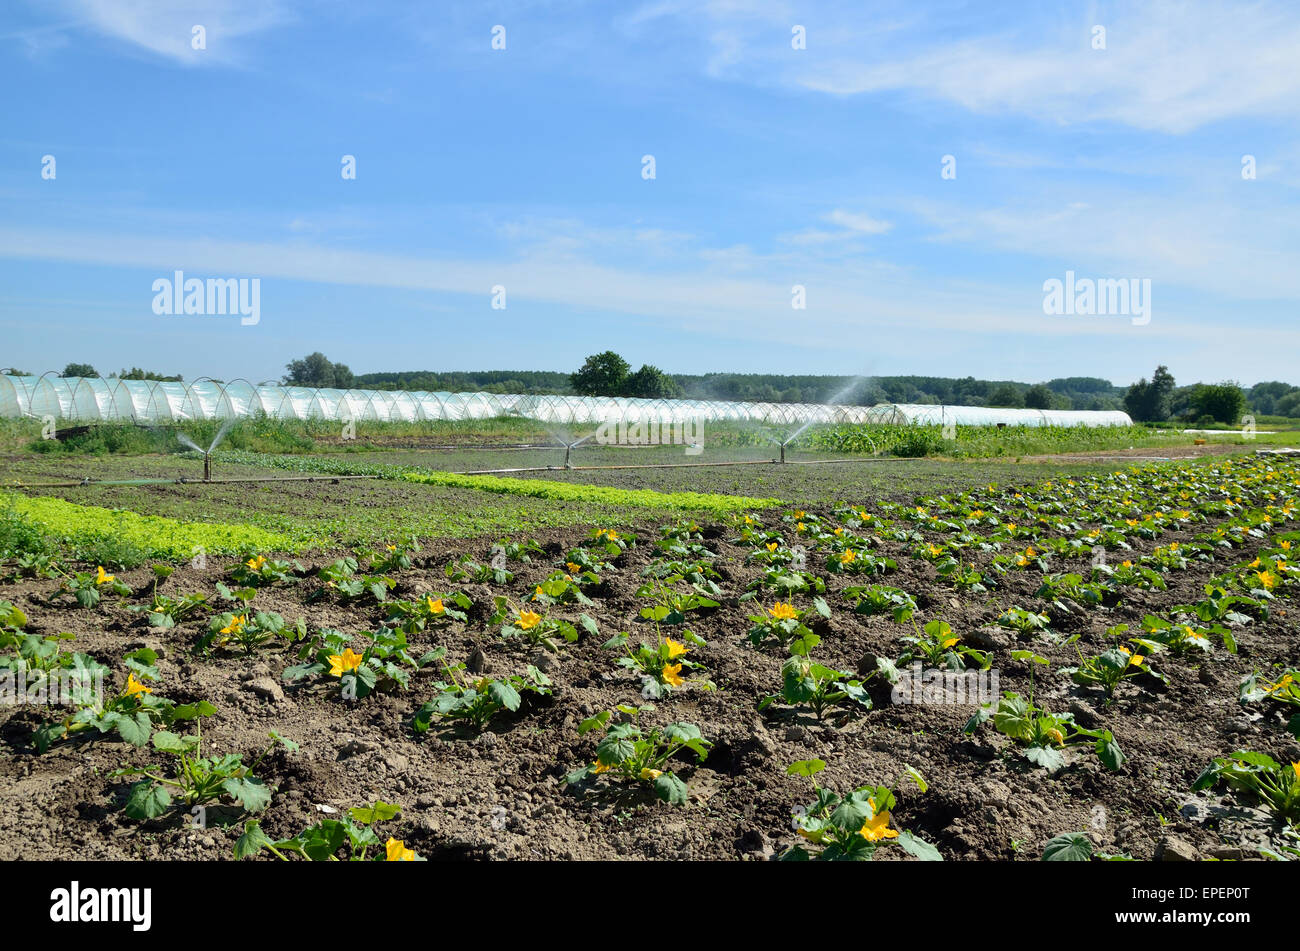 I Campi Di Zucchine Con Irrigazione E Serre In Background